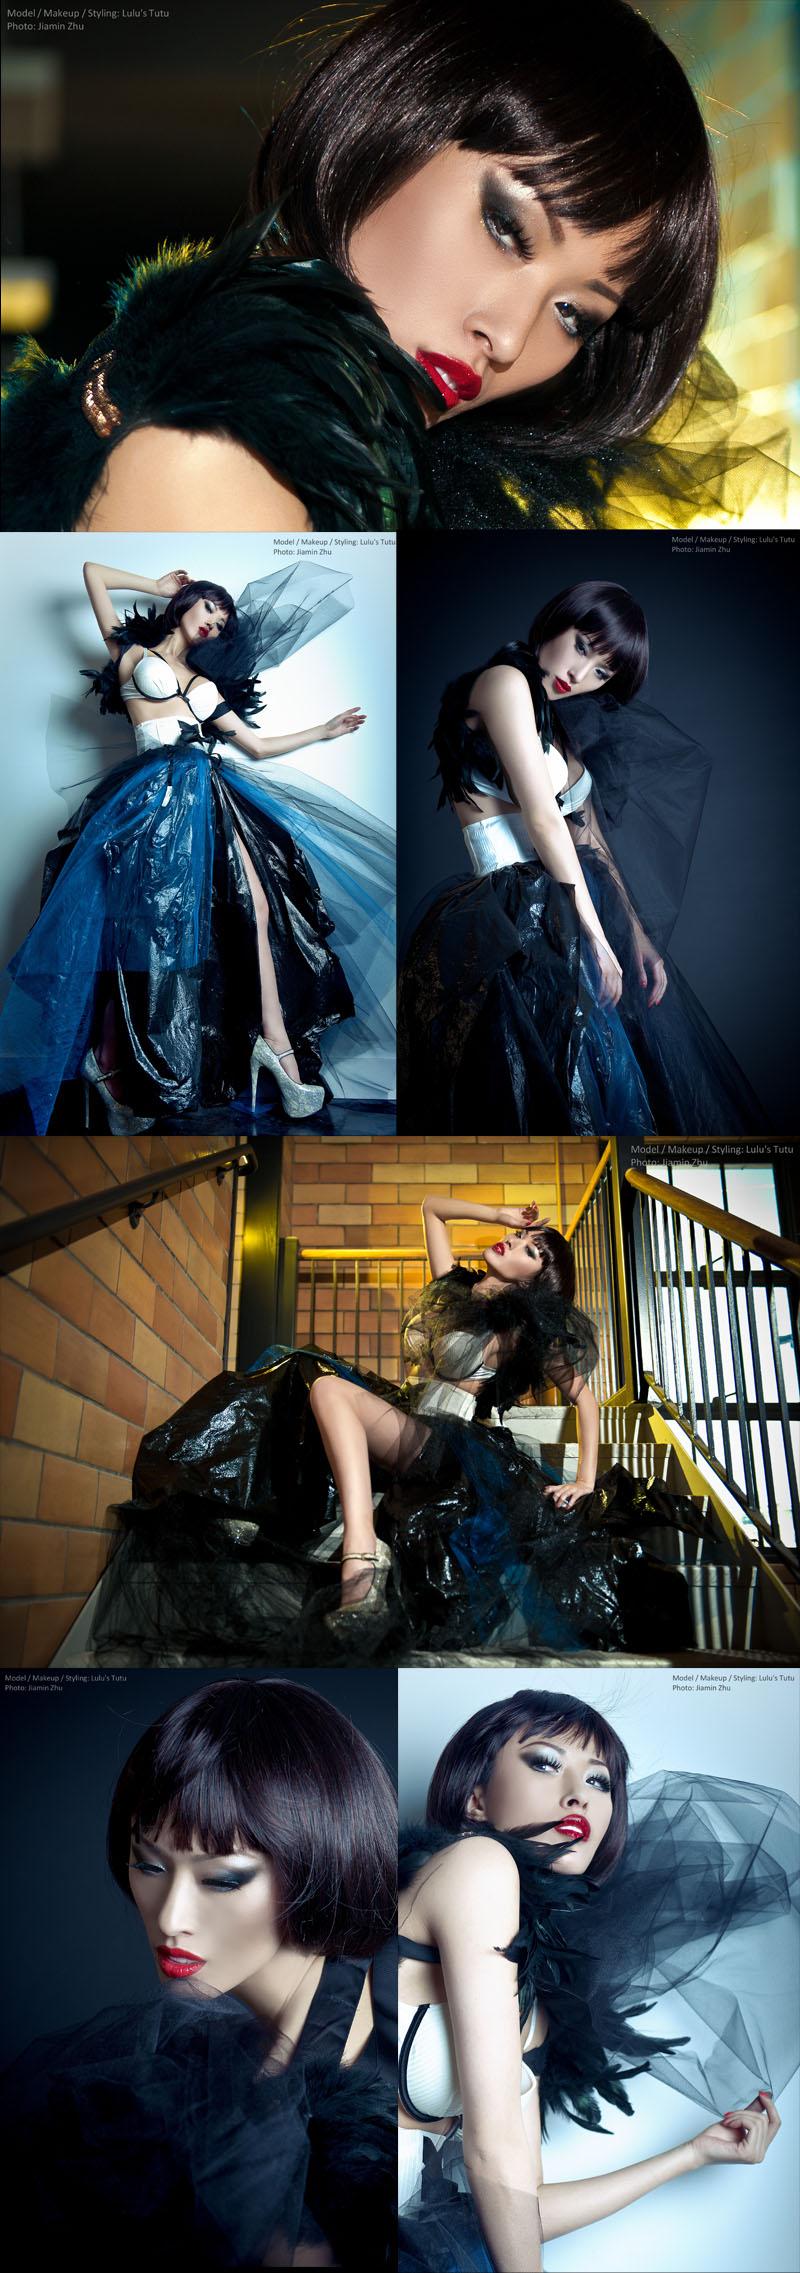 Apr 30, 2012 JaJasGarden Trashy Couture